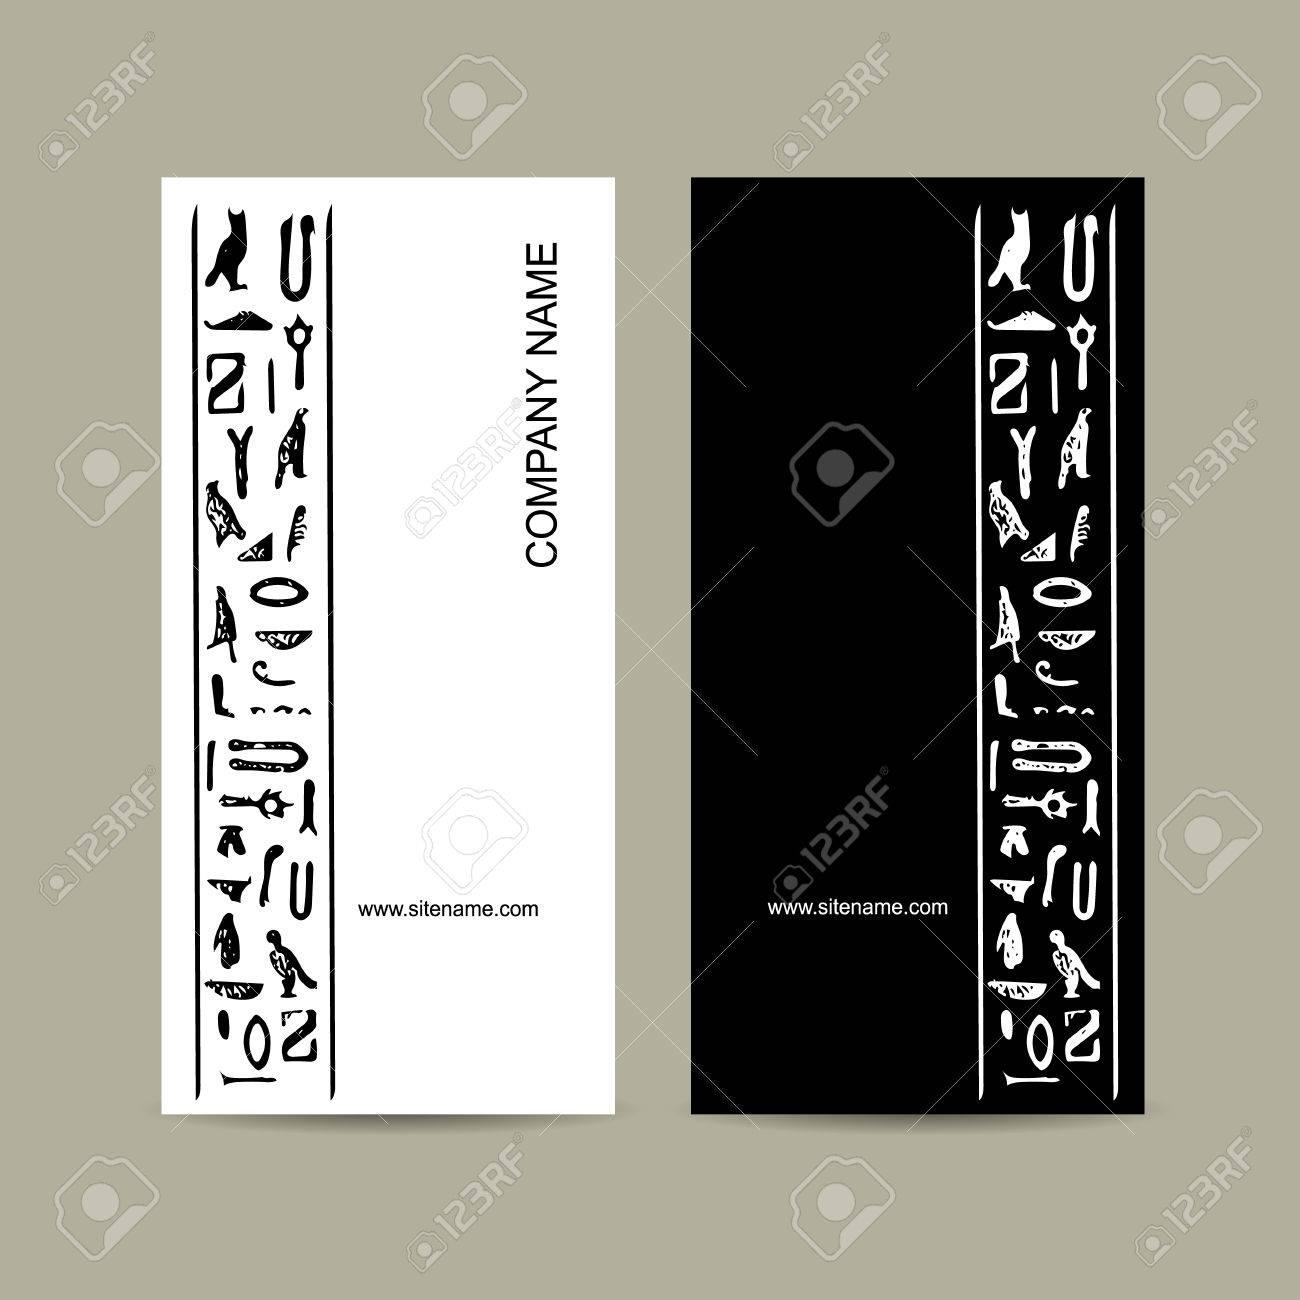 Cartes De Visite Design Vector Illustration Banque Dimages